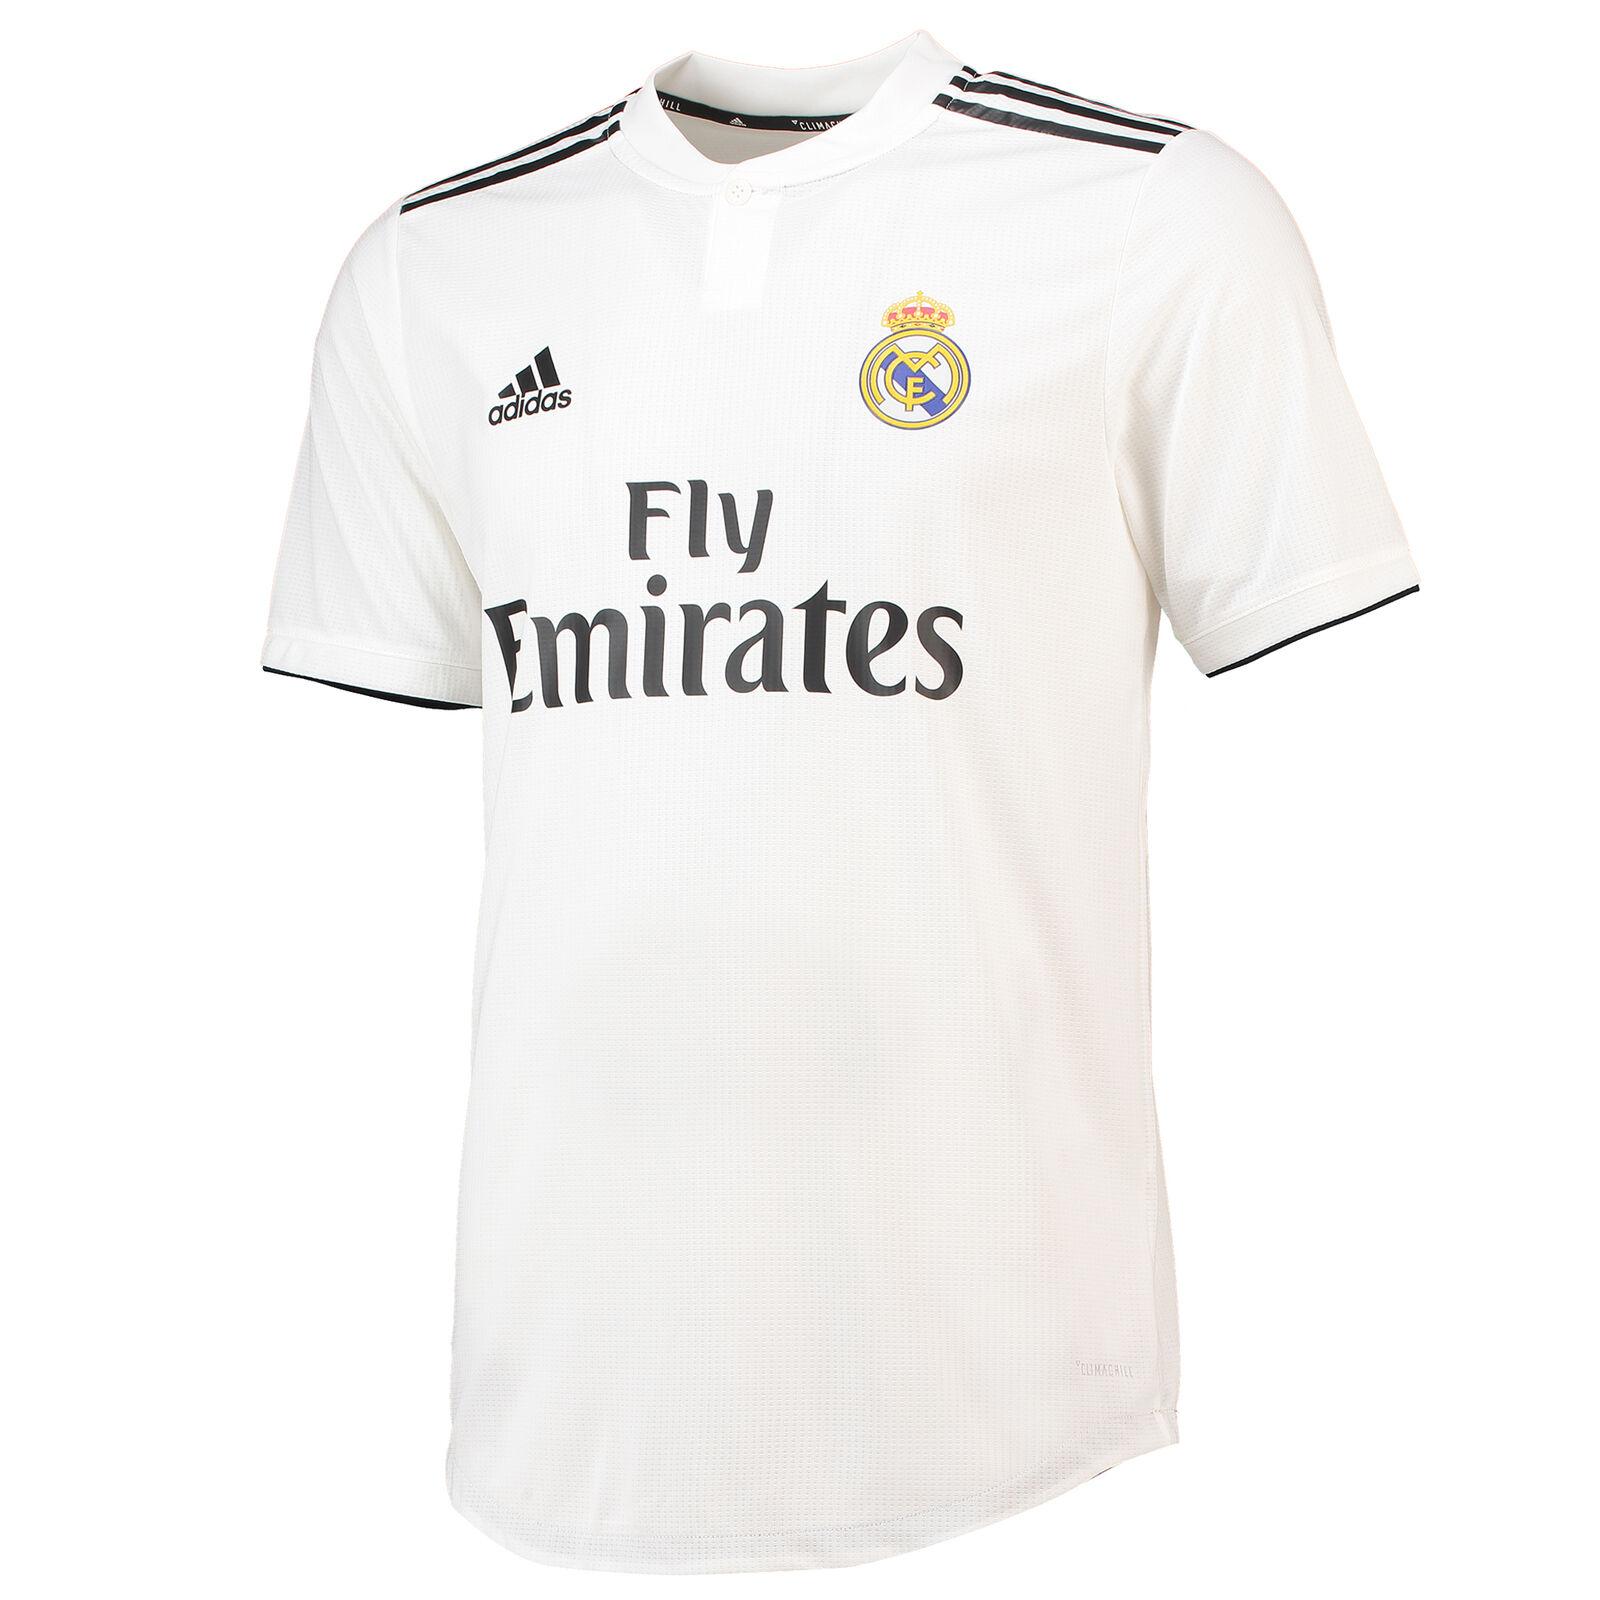 Real MADRID Auténtico Camisa 2018 19 para hombre Adidas Football